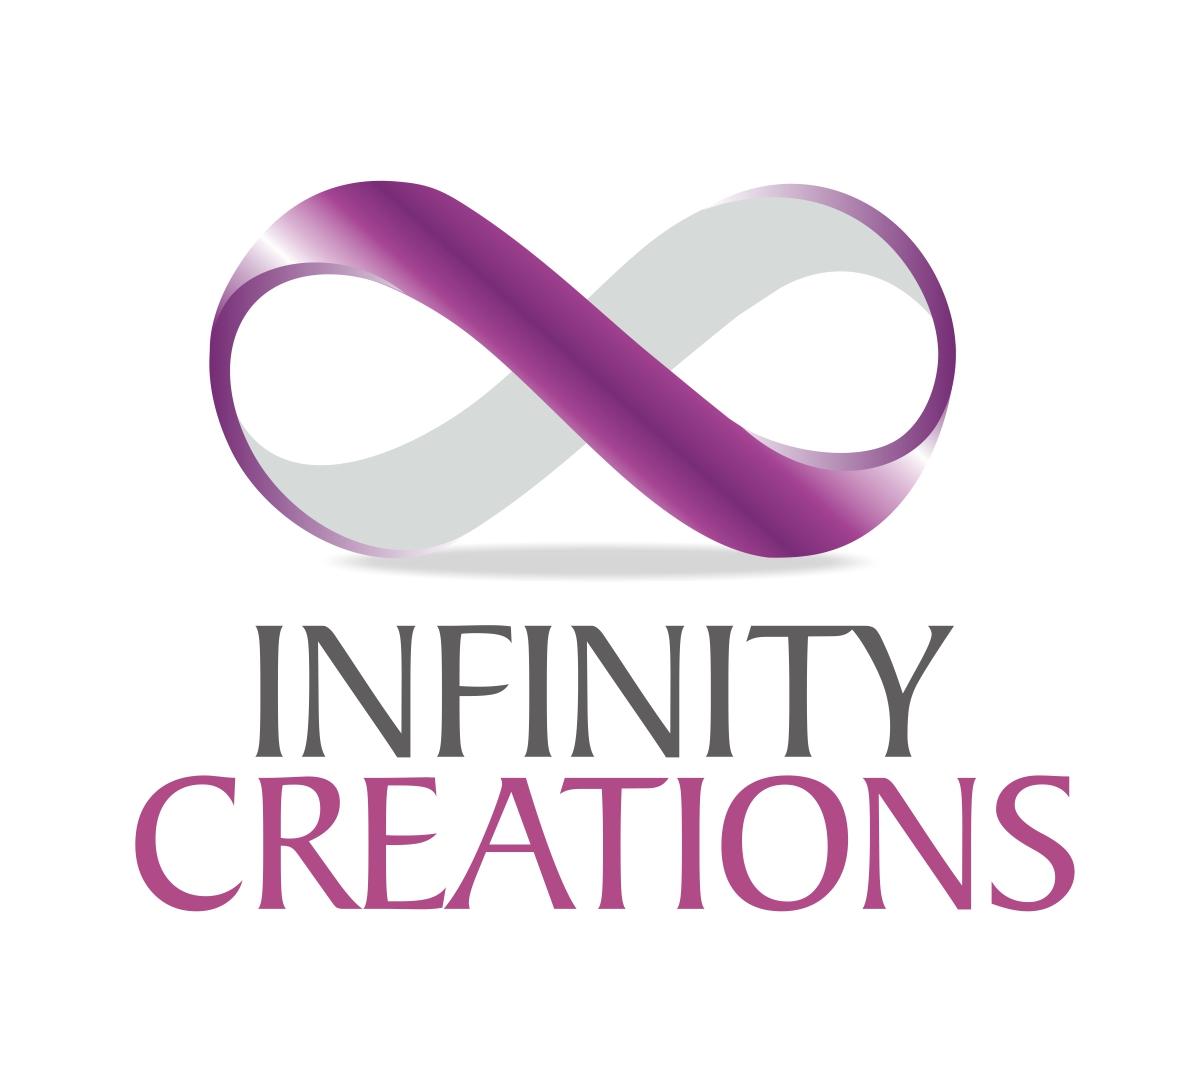 www.infinitycreations.com.ng